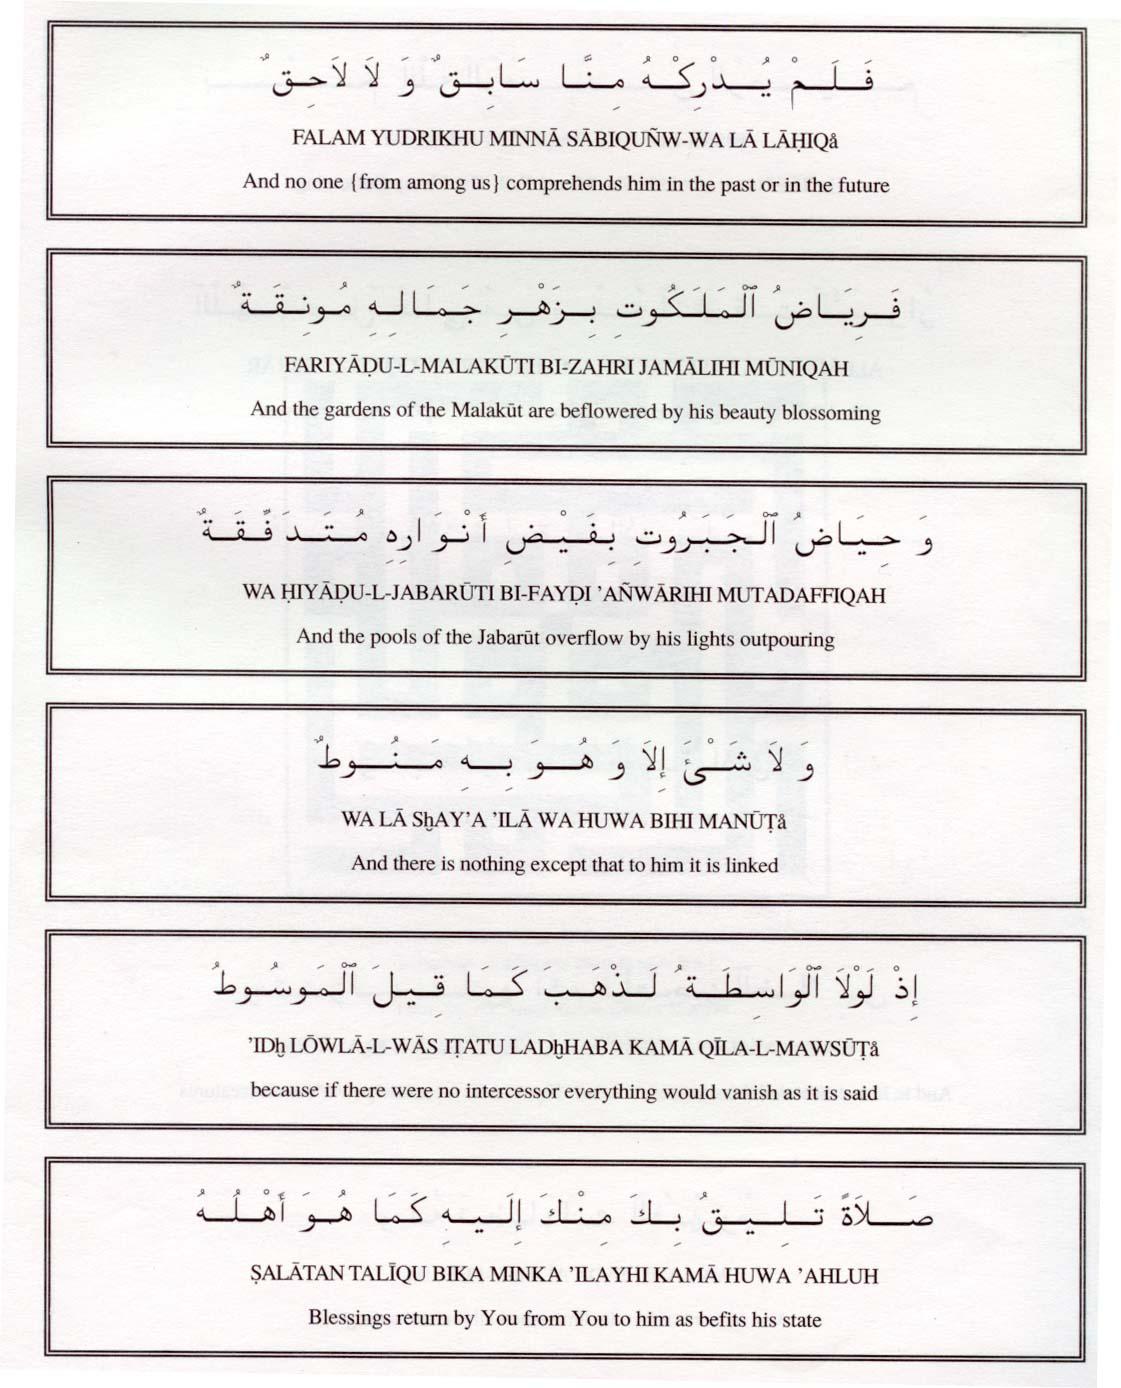 selichot prayers in english pdf